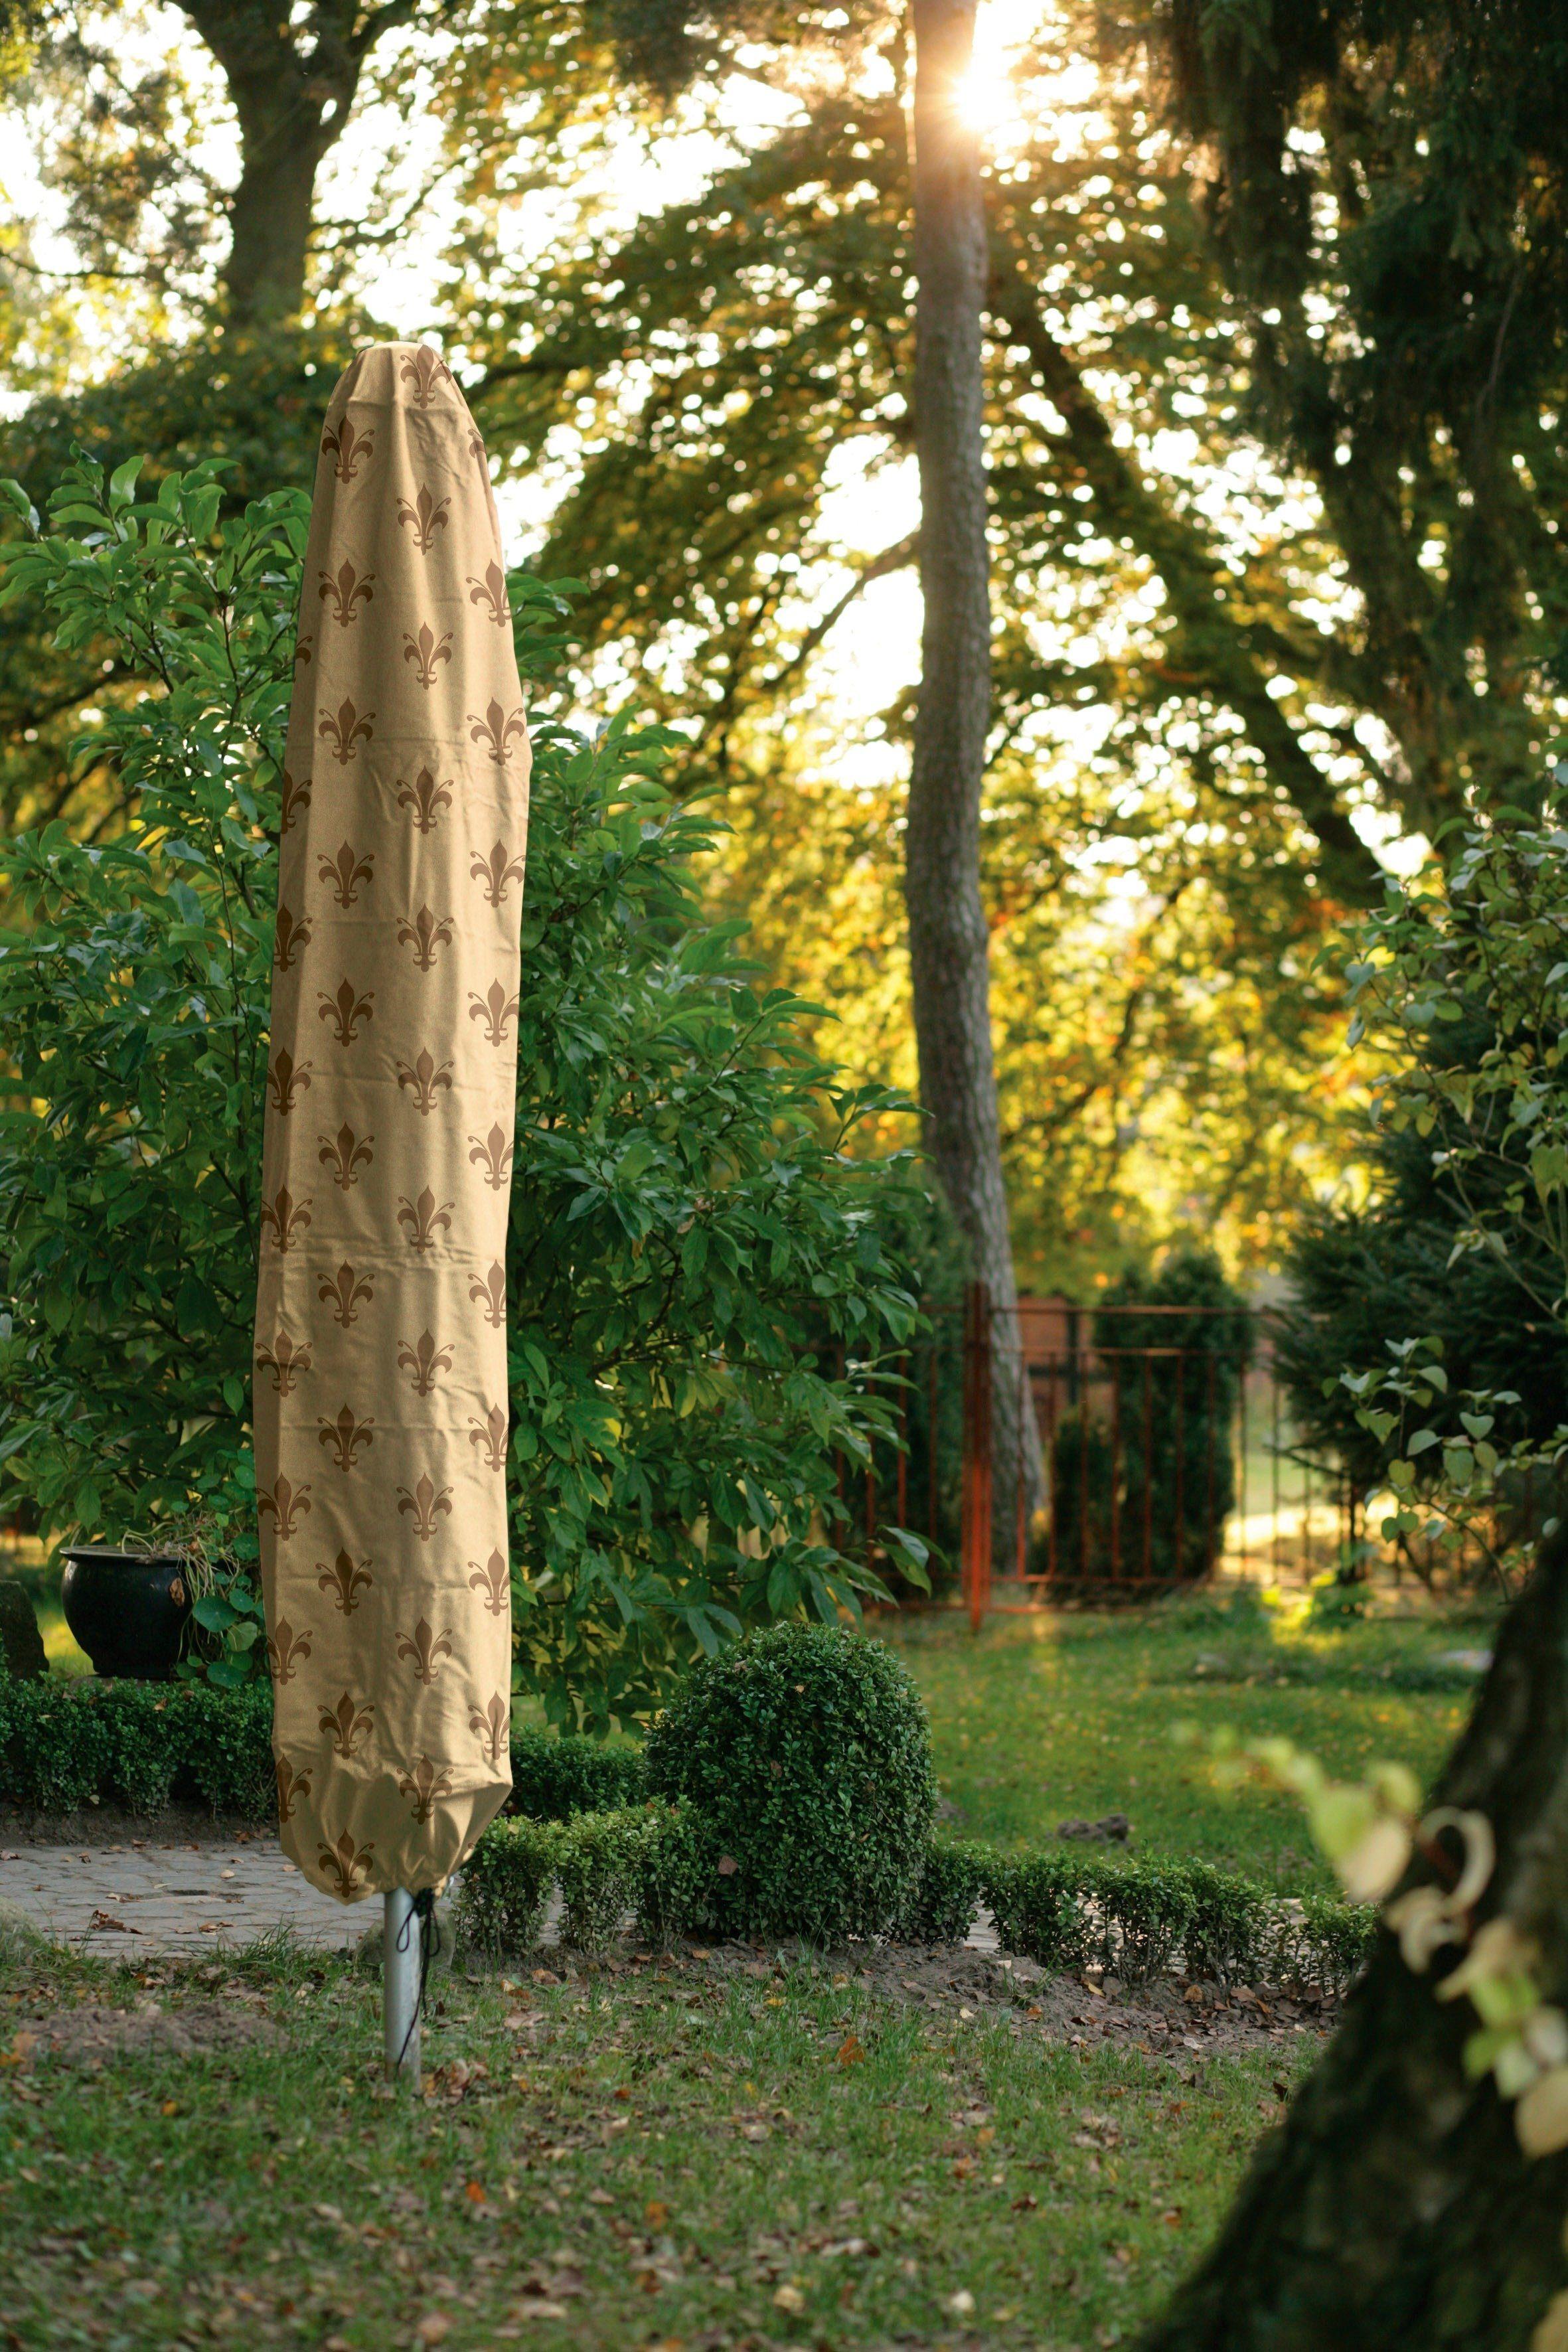 Videx Schutzhülle, Sonnenschirm, Ø 35 cm H 210 cm